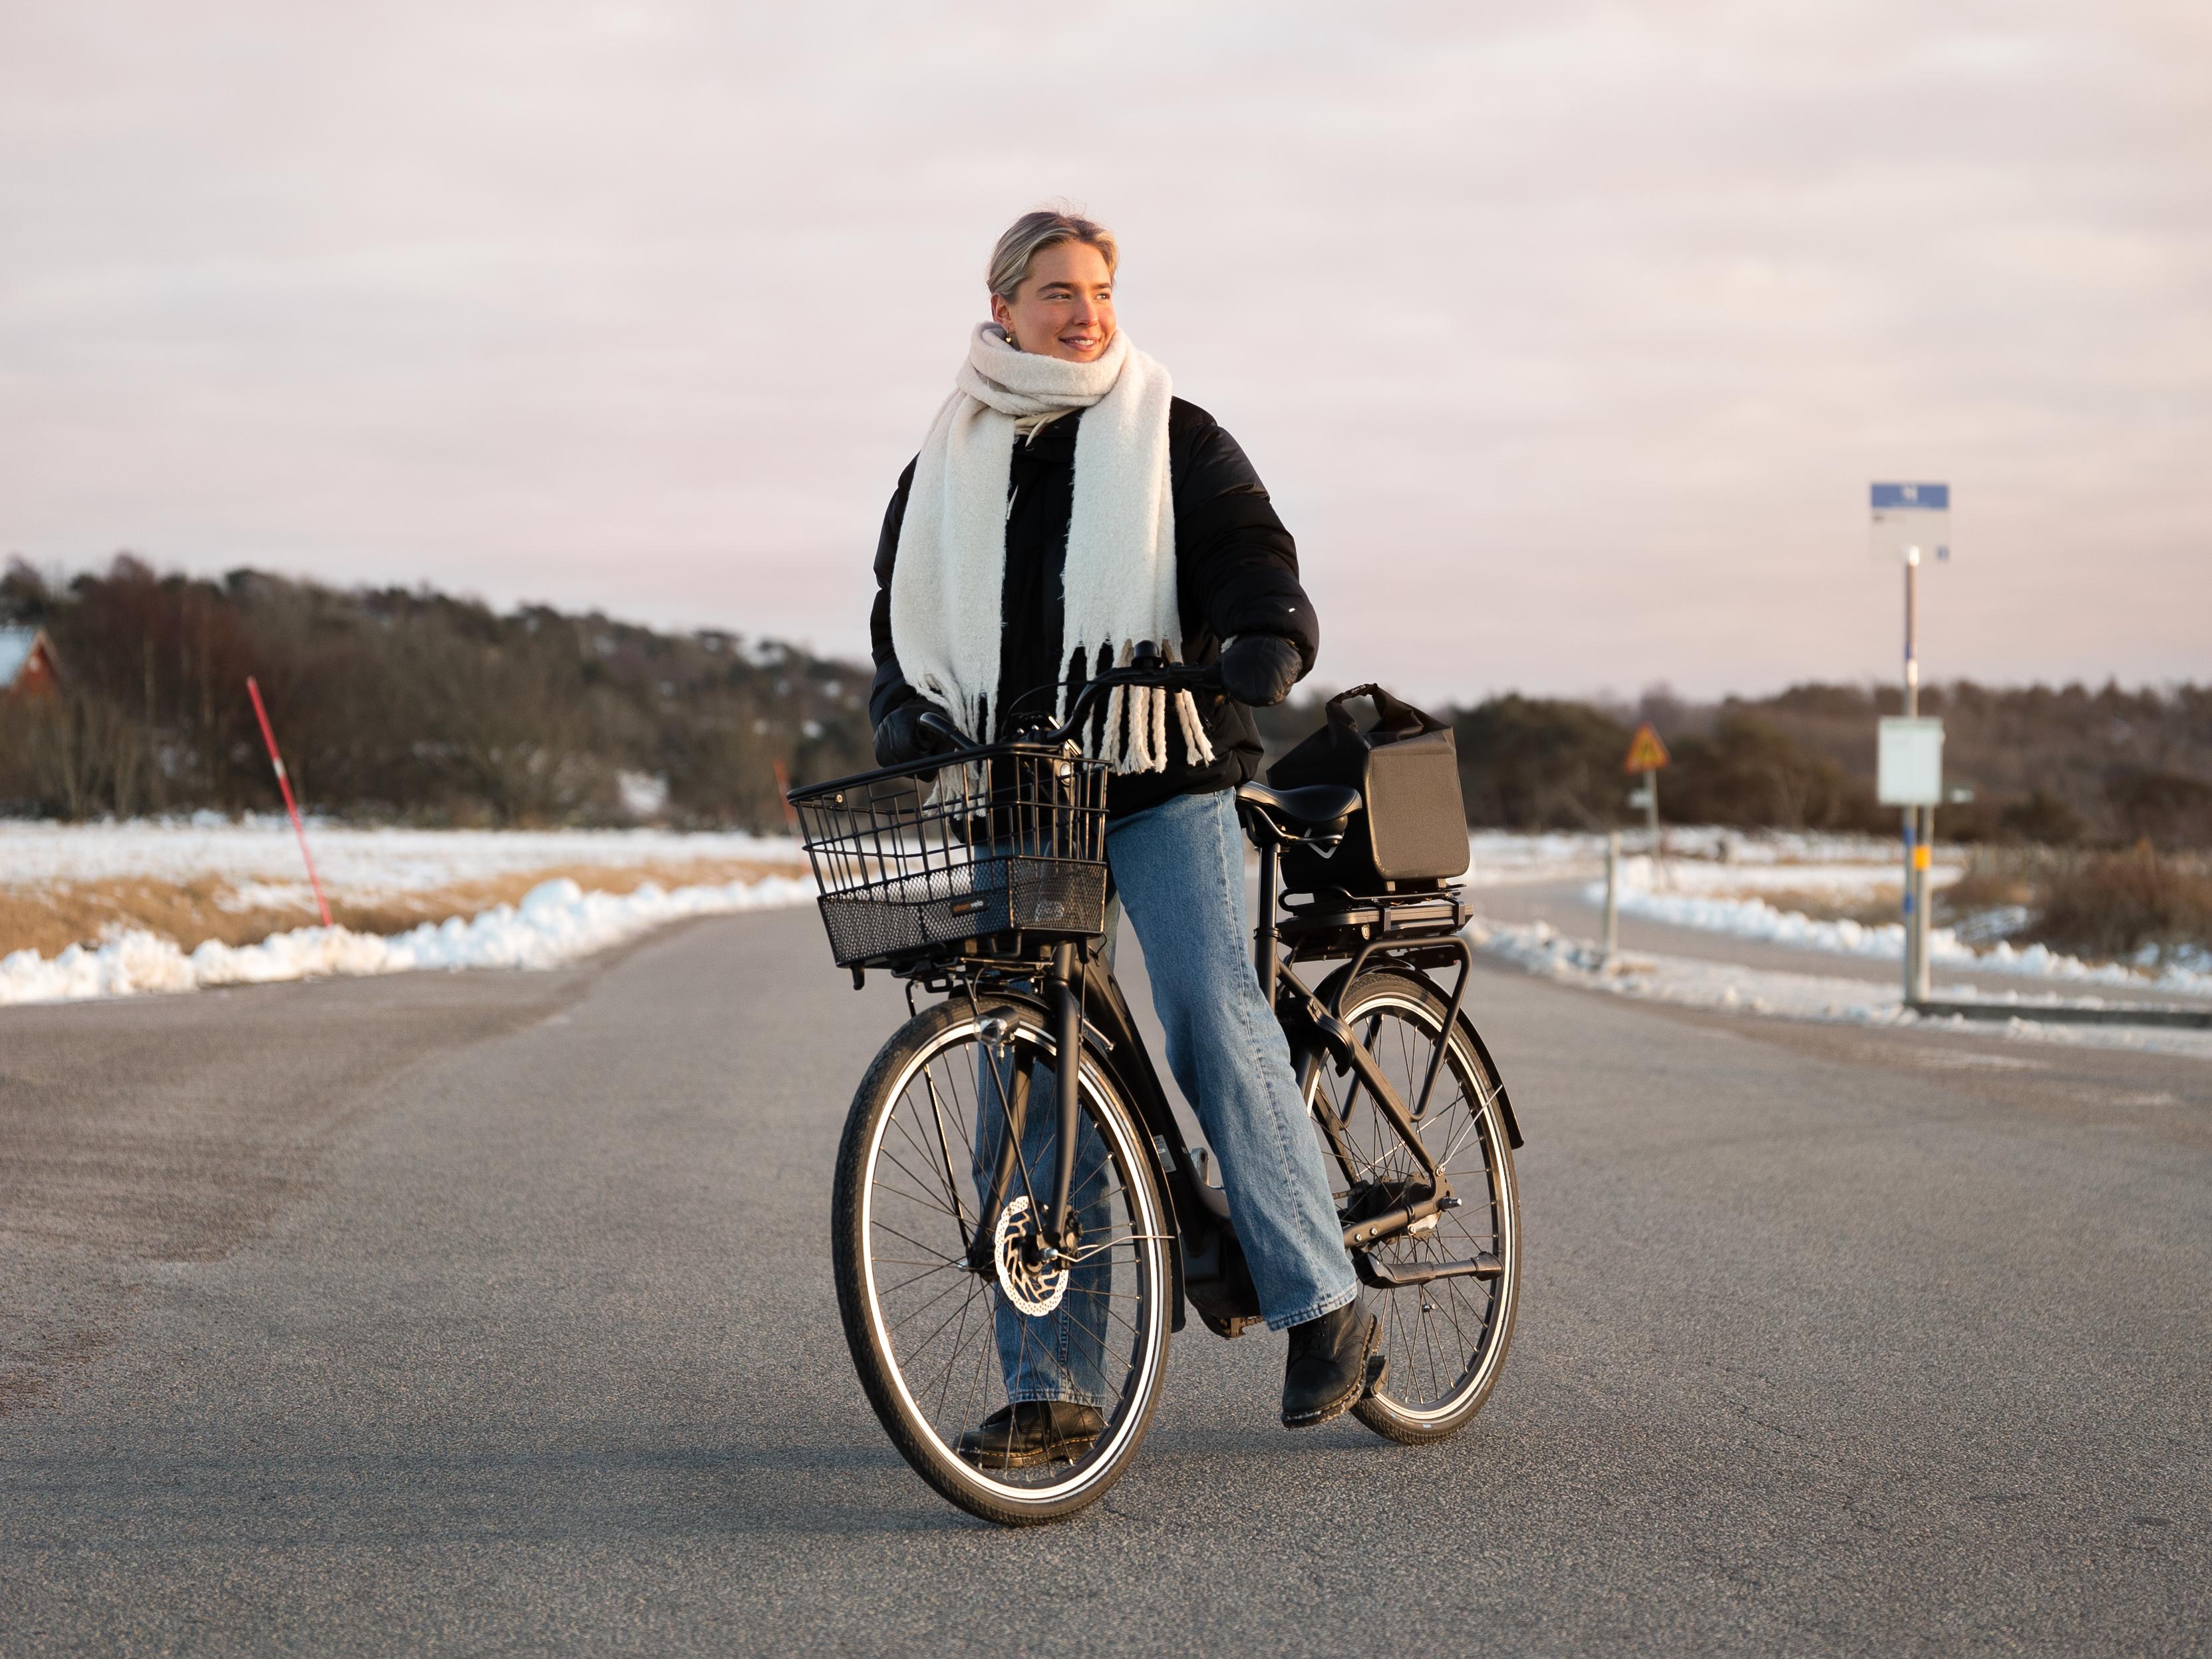 AtranVelo - Award-Winning Bicycle Components